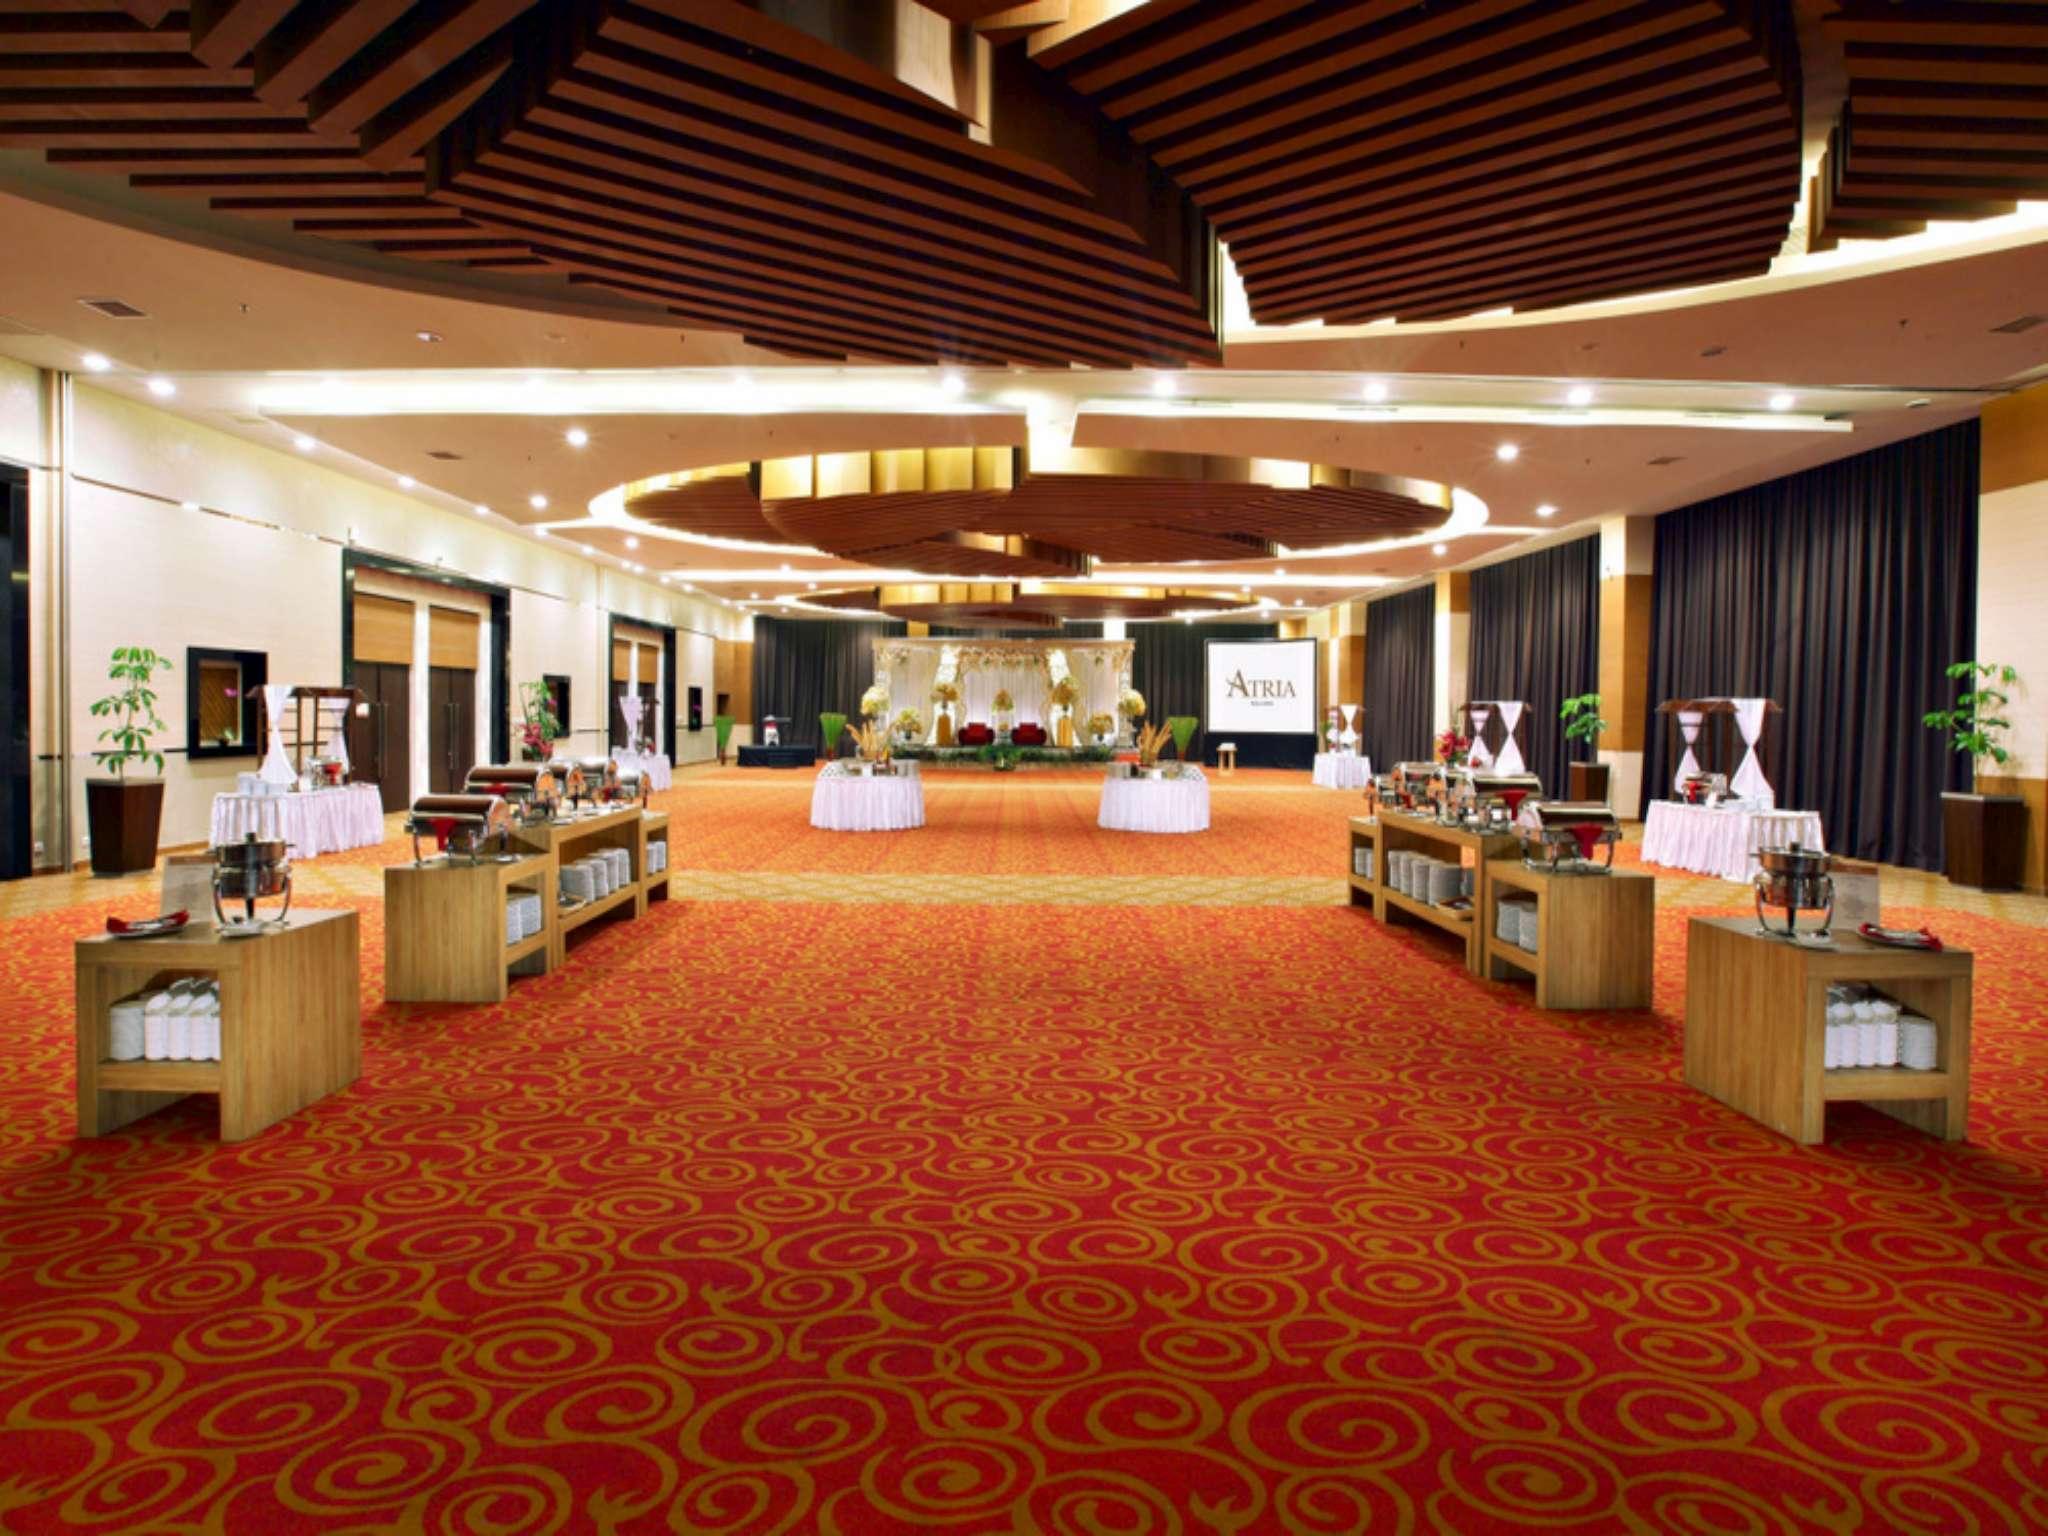 Atria hotel malang in indonesia